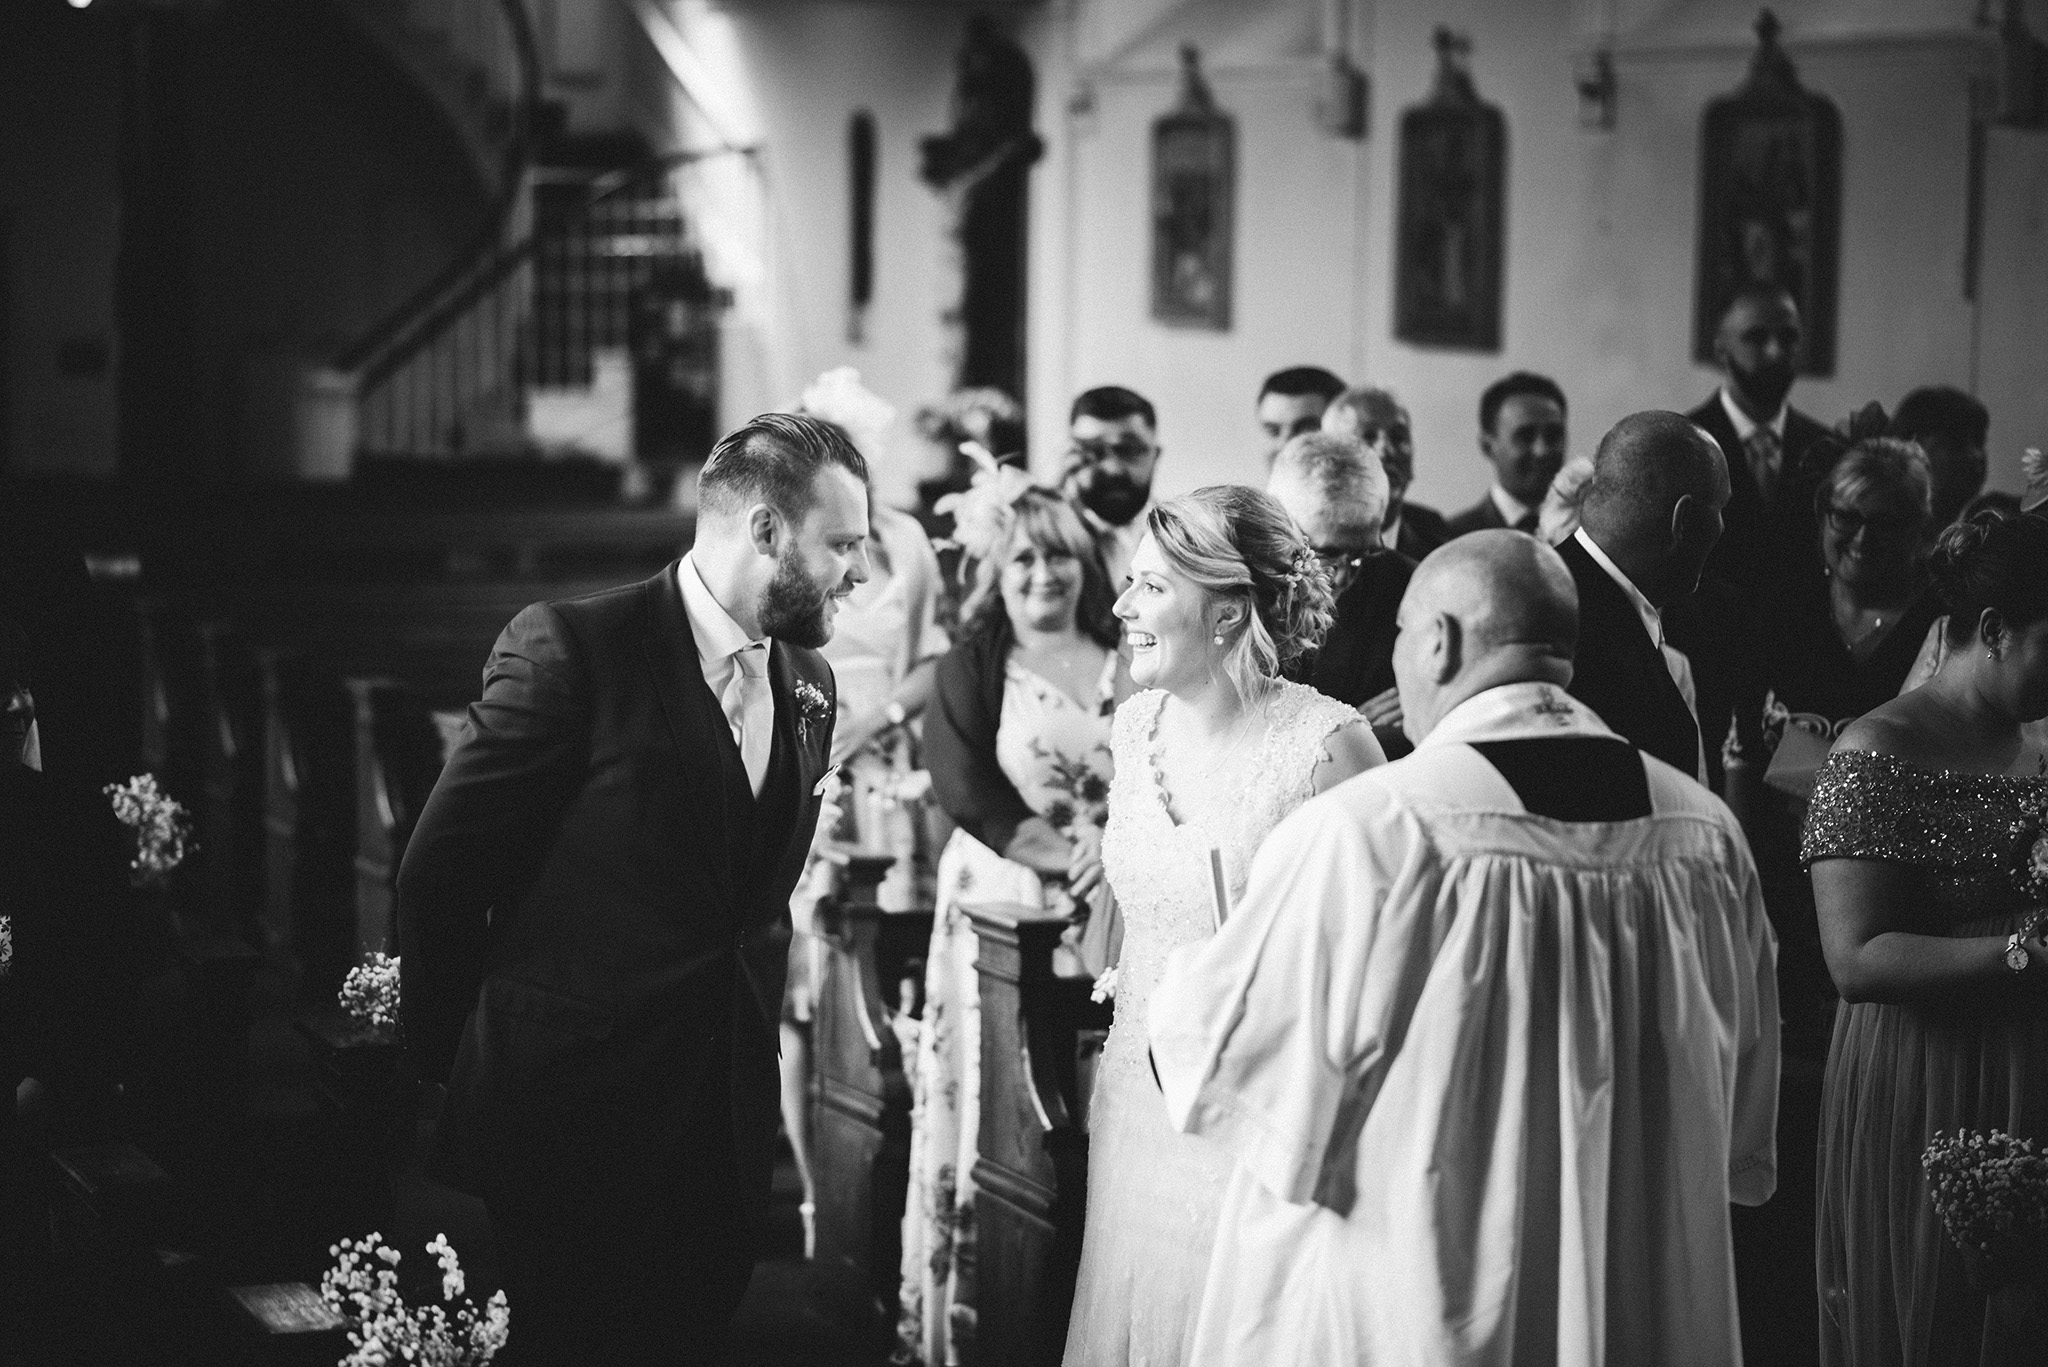 scott-stockwell-photography-wedding-14.jpg